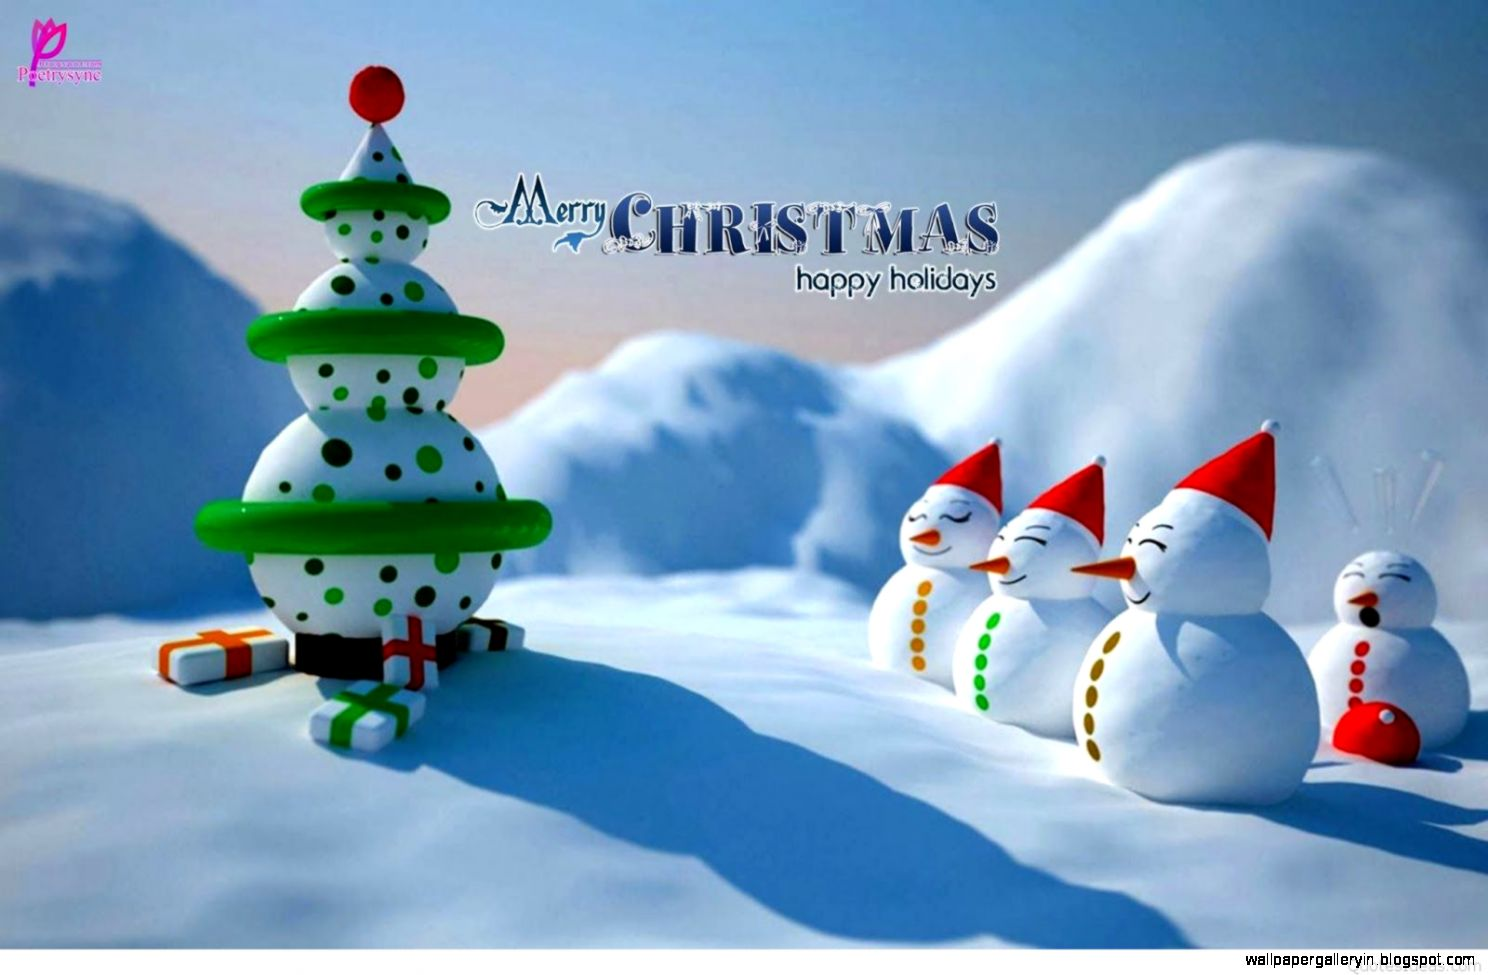 Merry Christmas Holiday Wallpaper